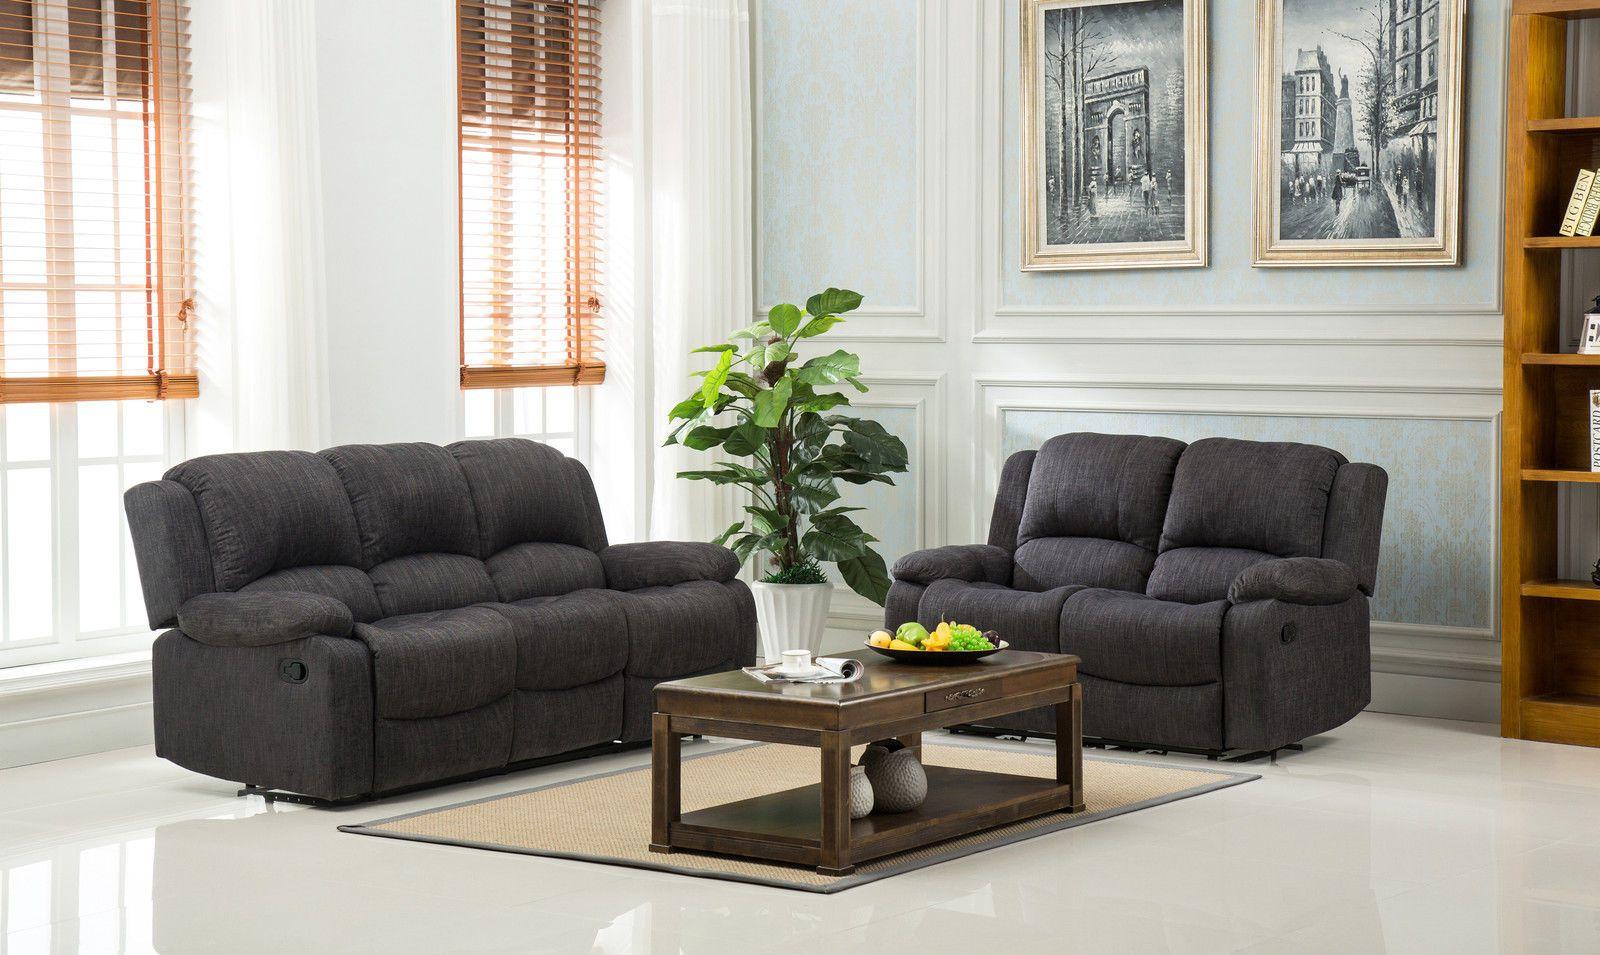 Modern Lazyboy Valencia 3 2 Seater Roxy Fabric Recliner Sofa Suite Dark Grey Ebay Reclining Sofa Buy Sofa Living Room Recliner